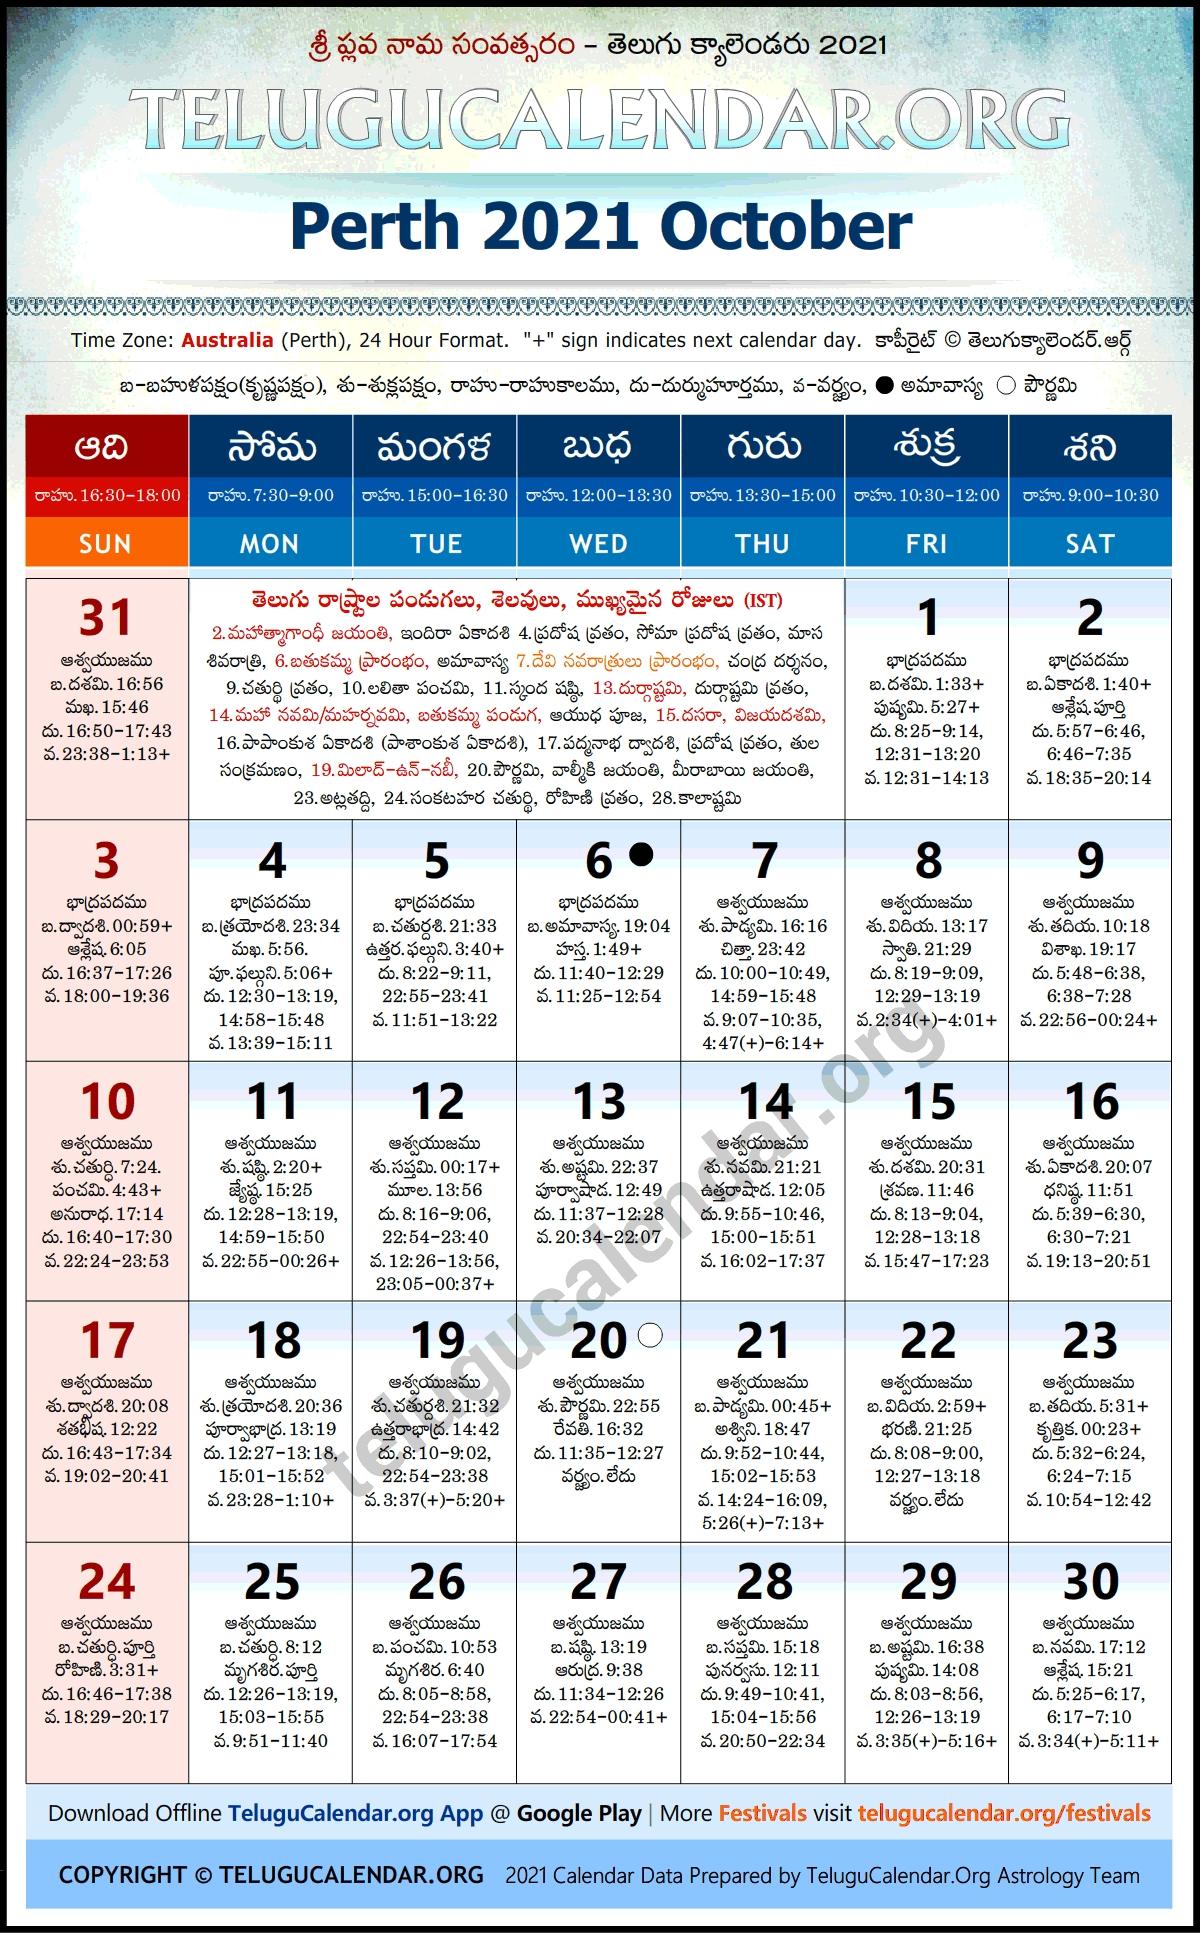 Perth 2021 October Telugu Calendar Festivals & Holidays Telugu Calendar 2021 October Andhra Pradesh